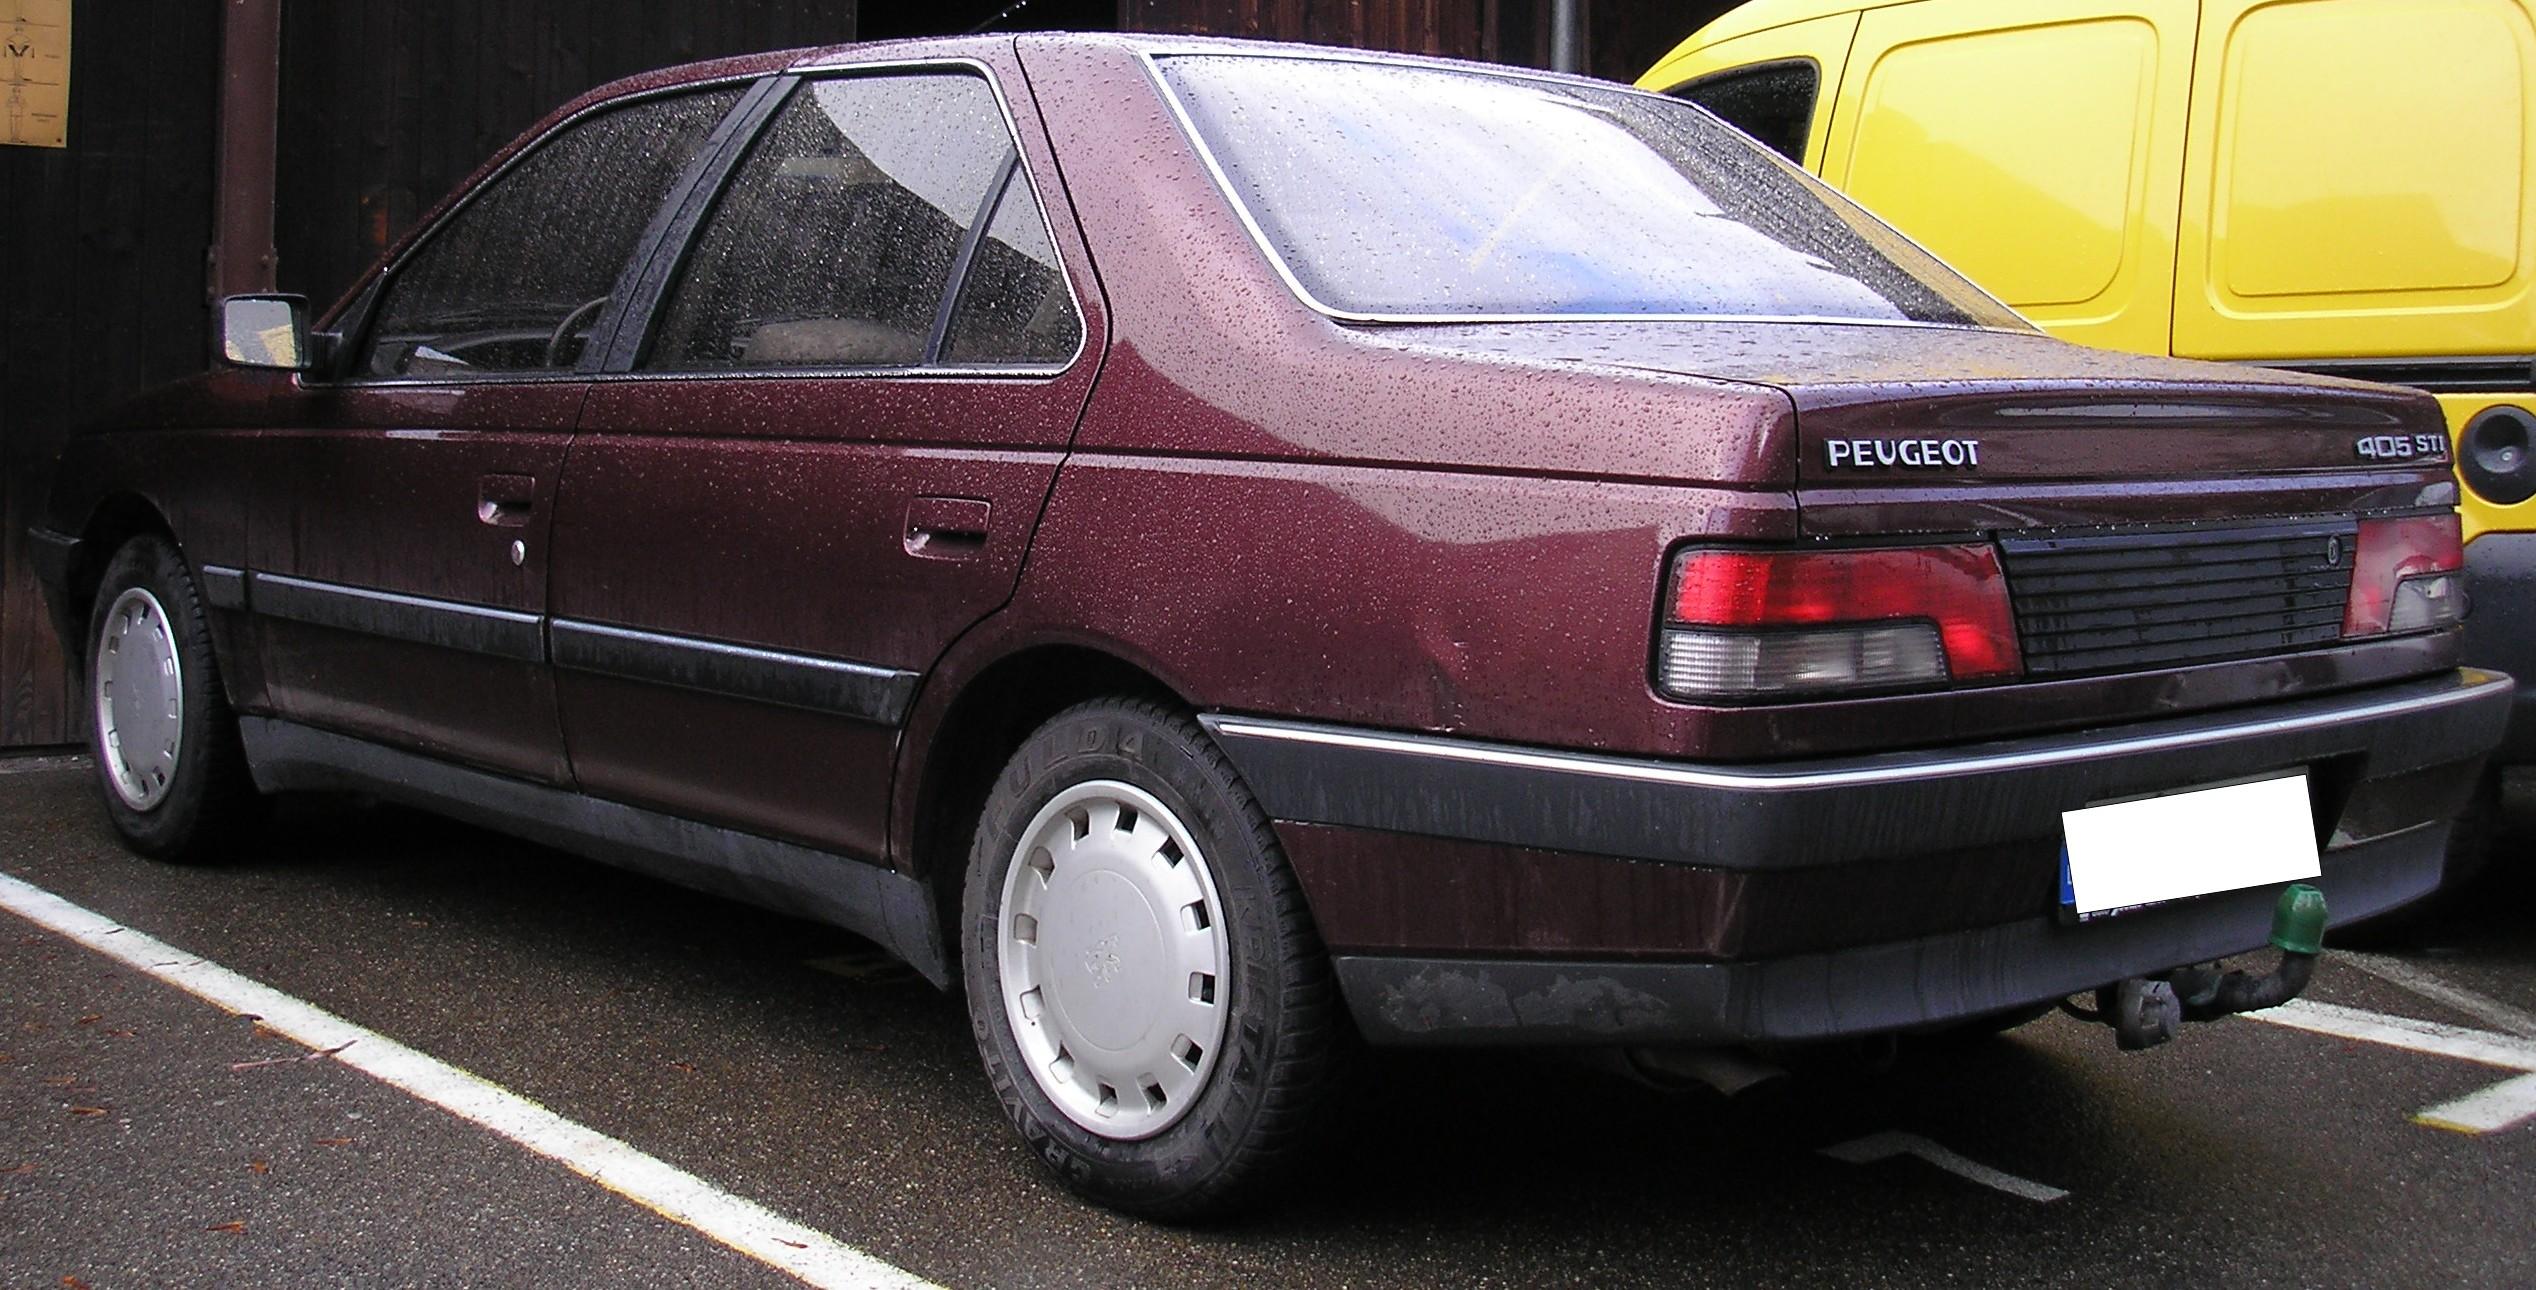 File:Peugeot 405 Rouge Rear.jpg